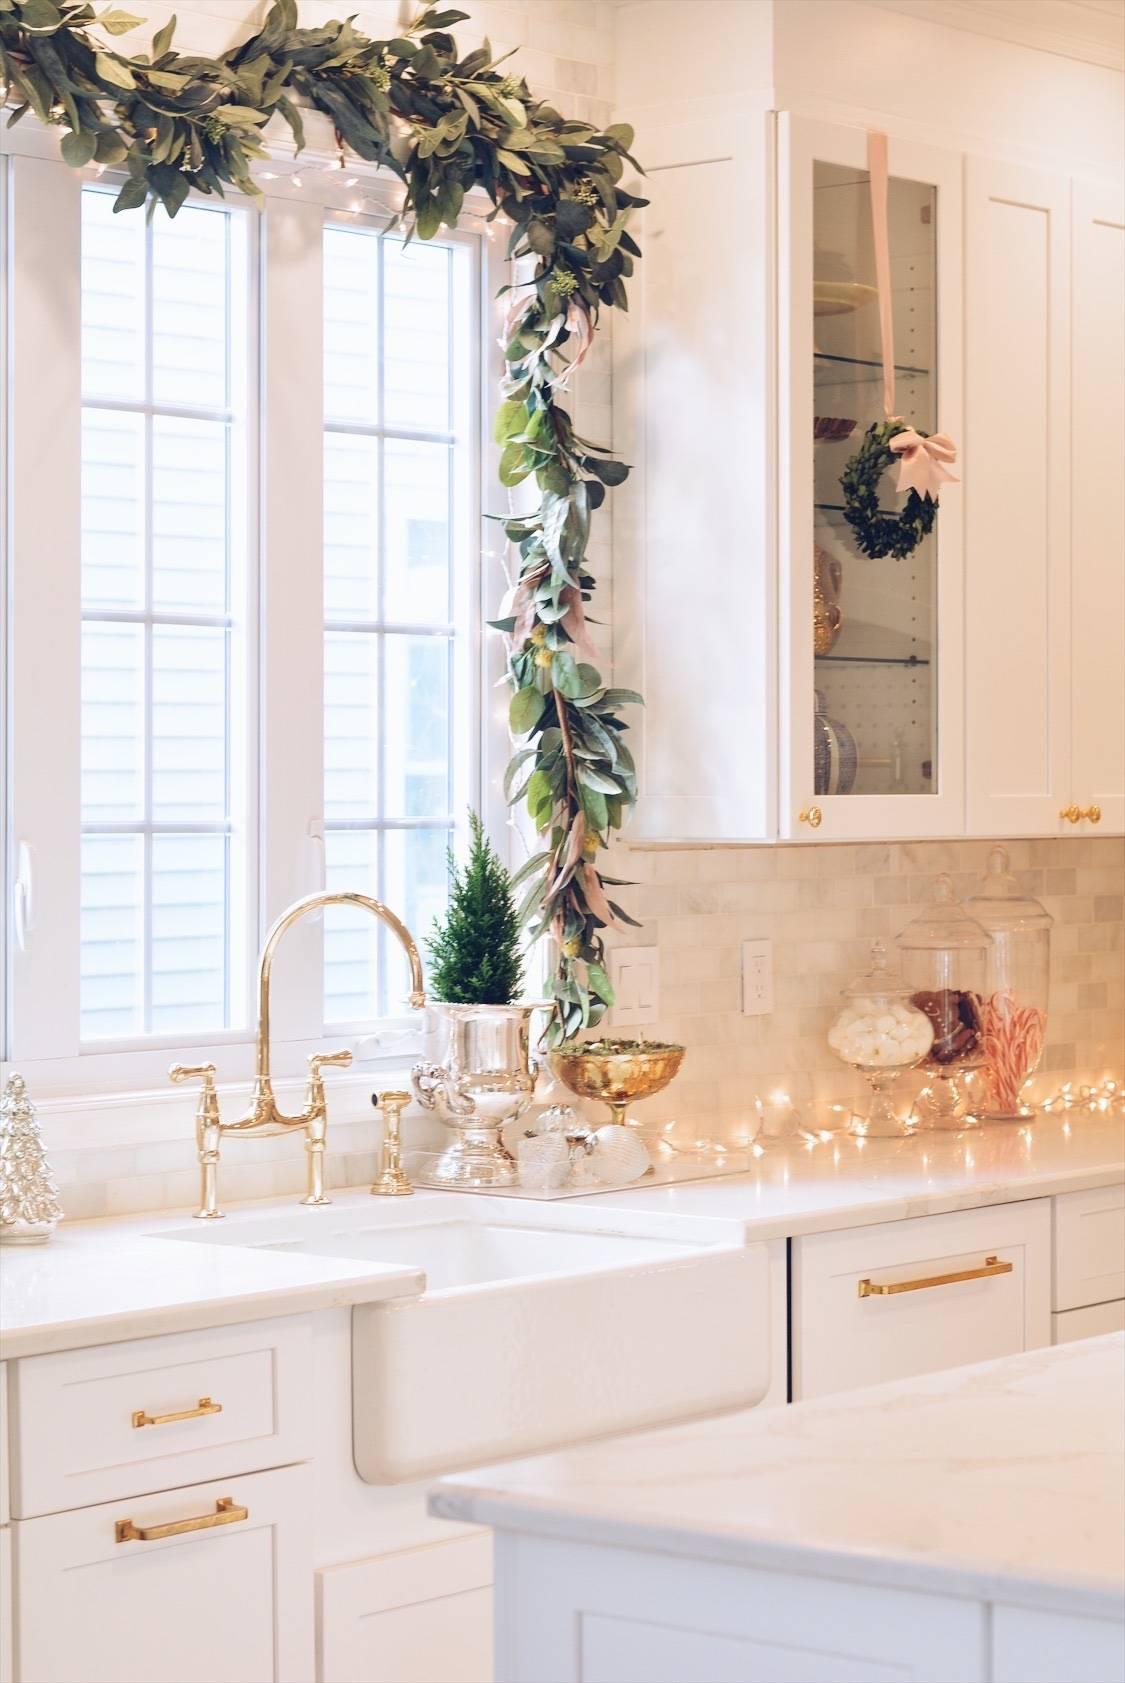 Elegant Christmas Part II - Christmas Kitchen Decor - The ...